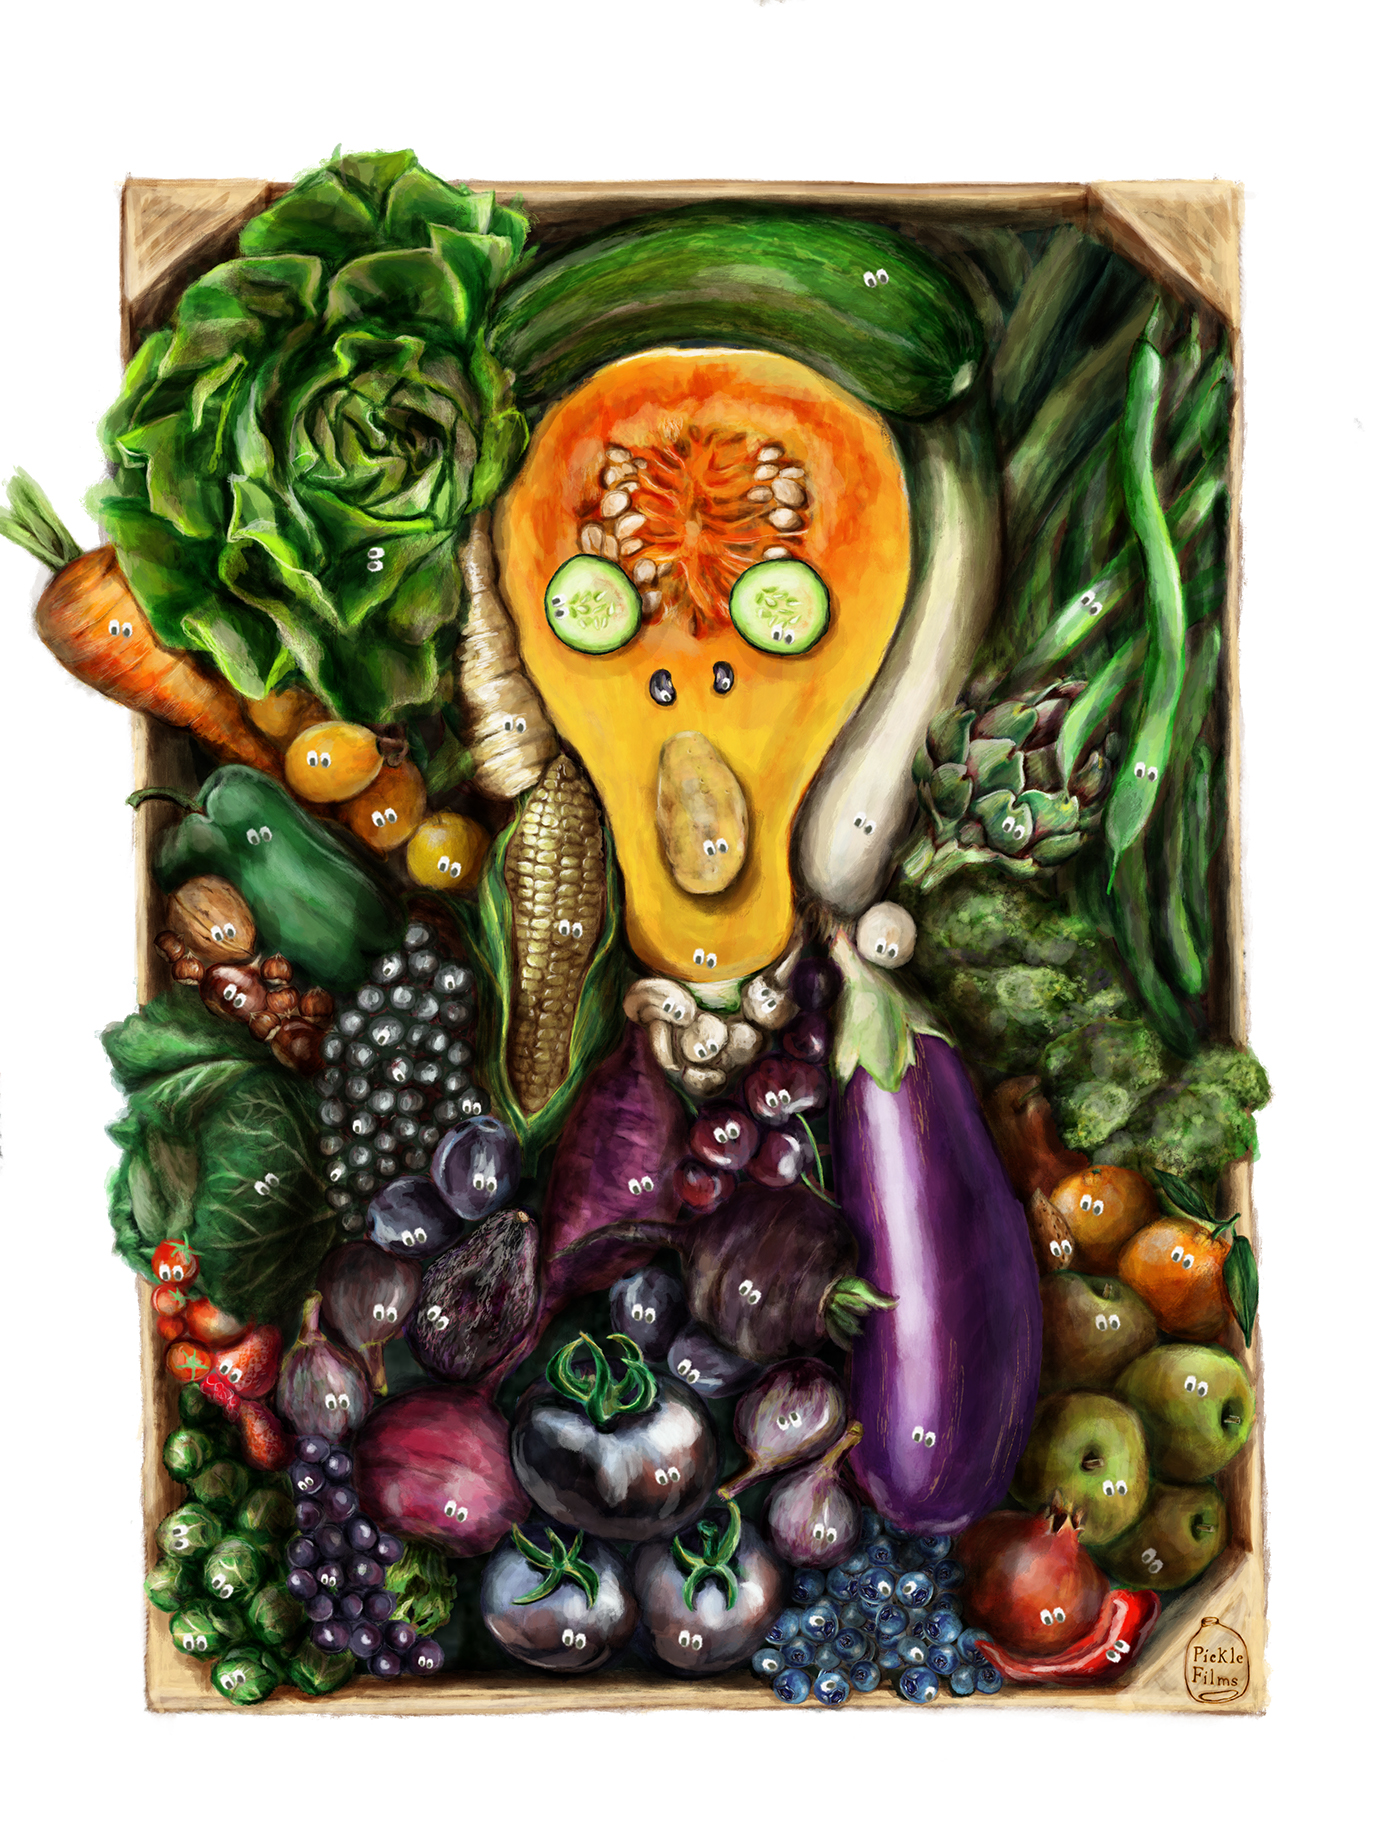 MunchContest TheGreenScream Picklefilms IIlustration vegetables hiddentreasures adobe ad Veggie